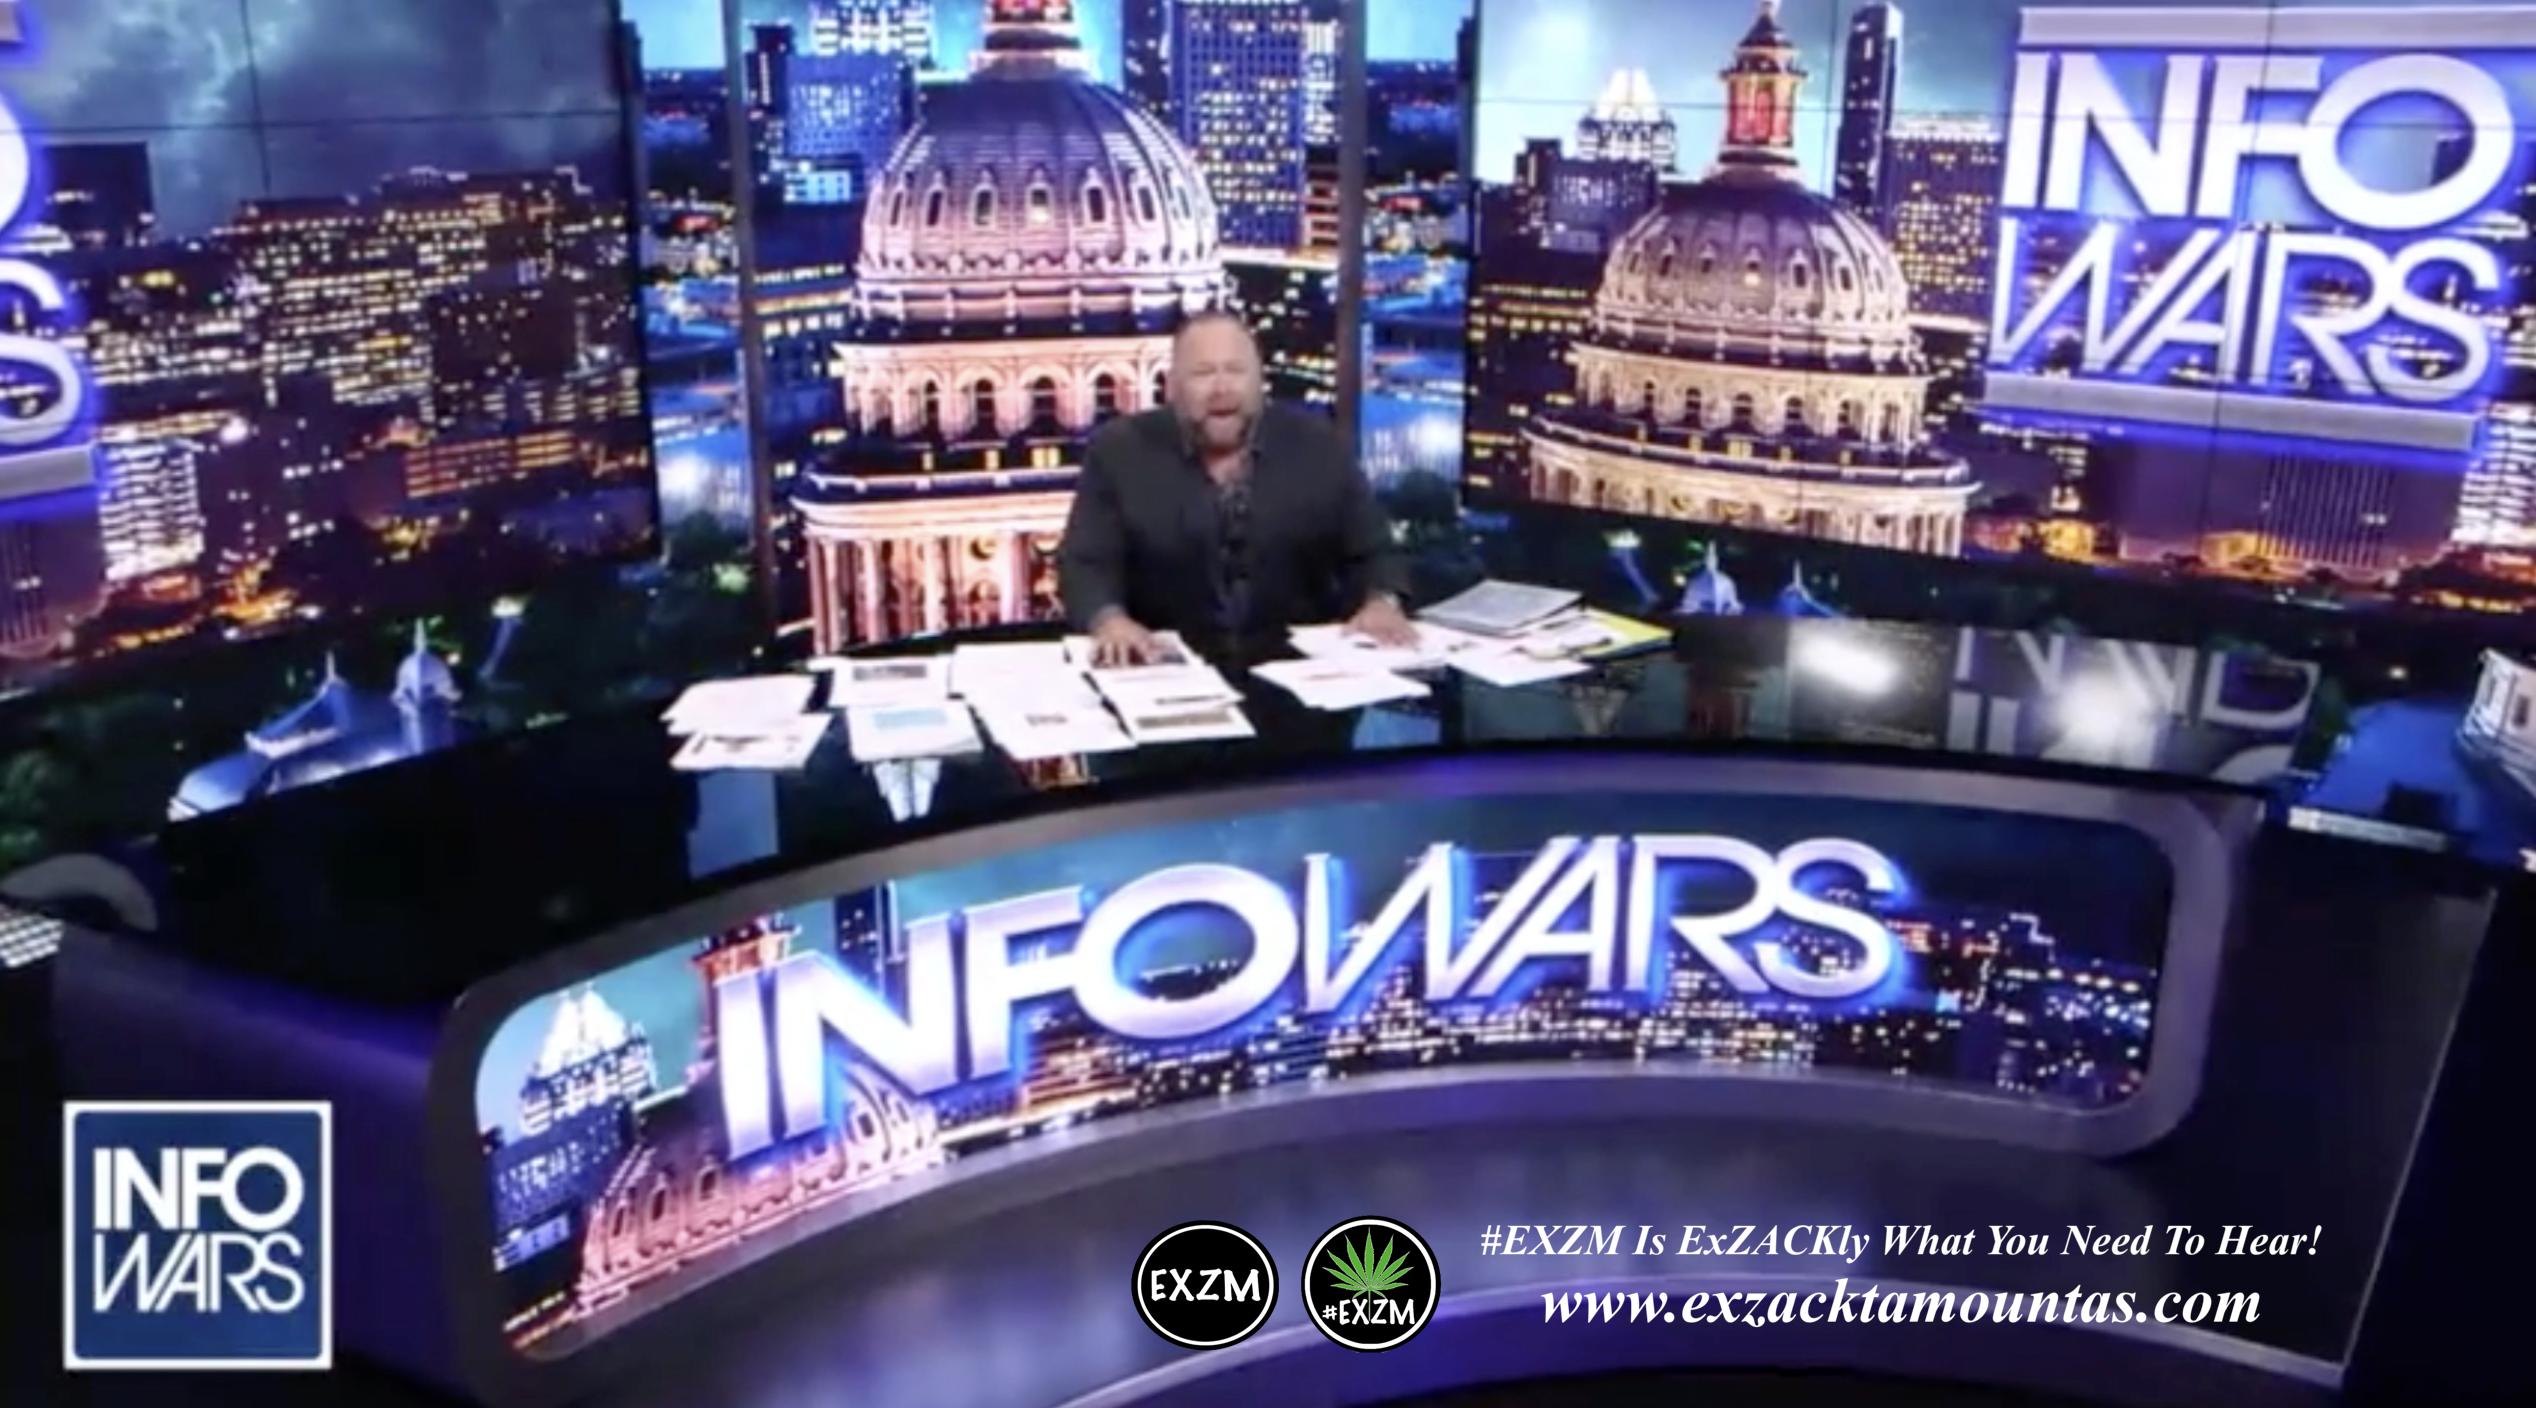 Alex Jones Live Infowars Studio EXZM Zack Mount April 9th 2021 copy